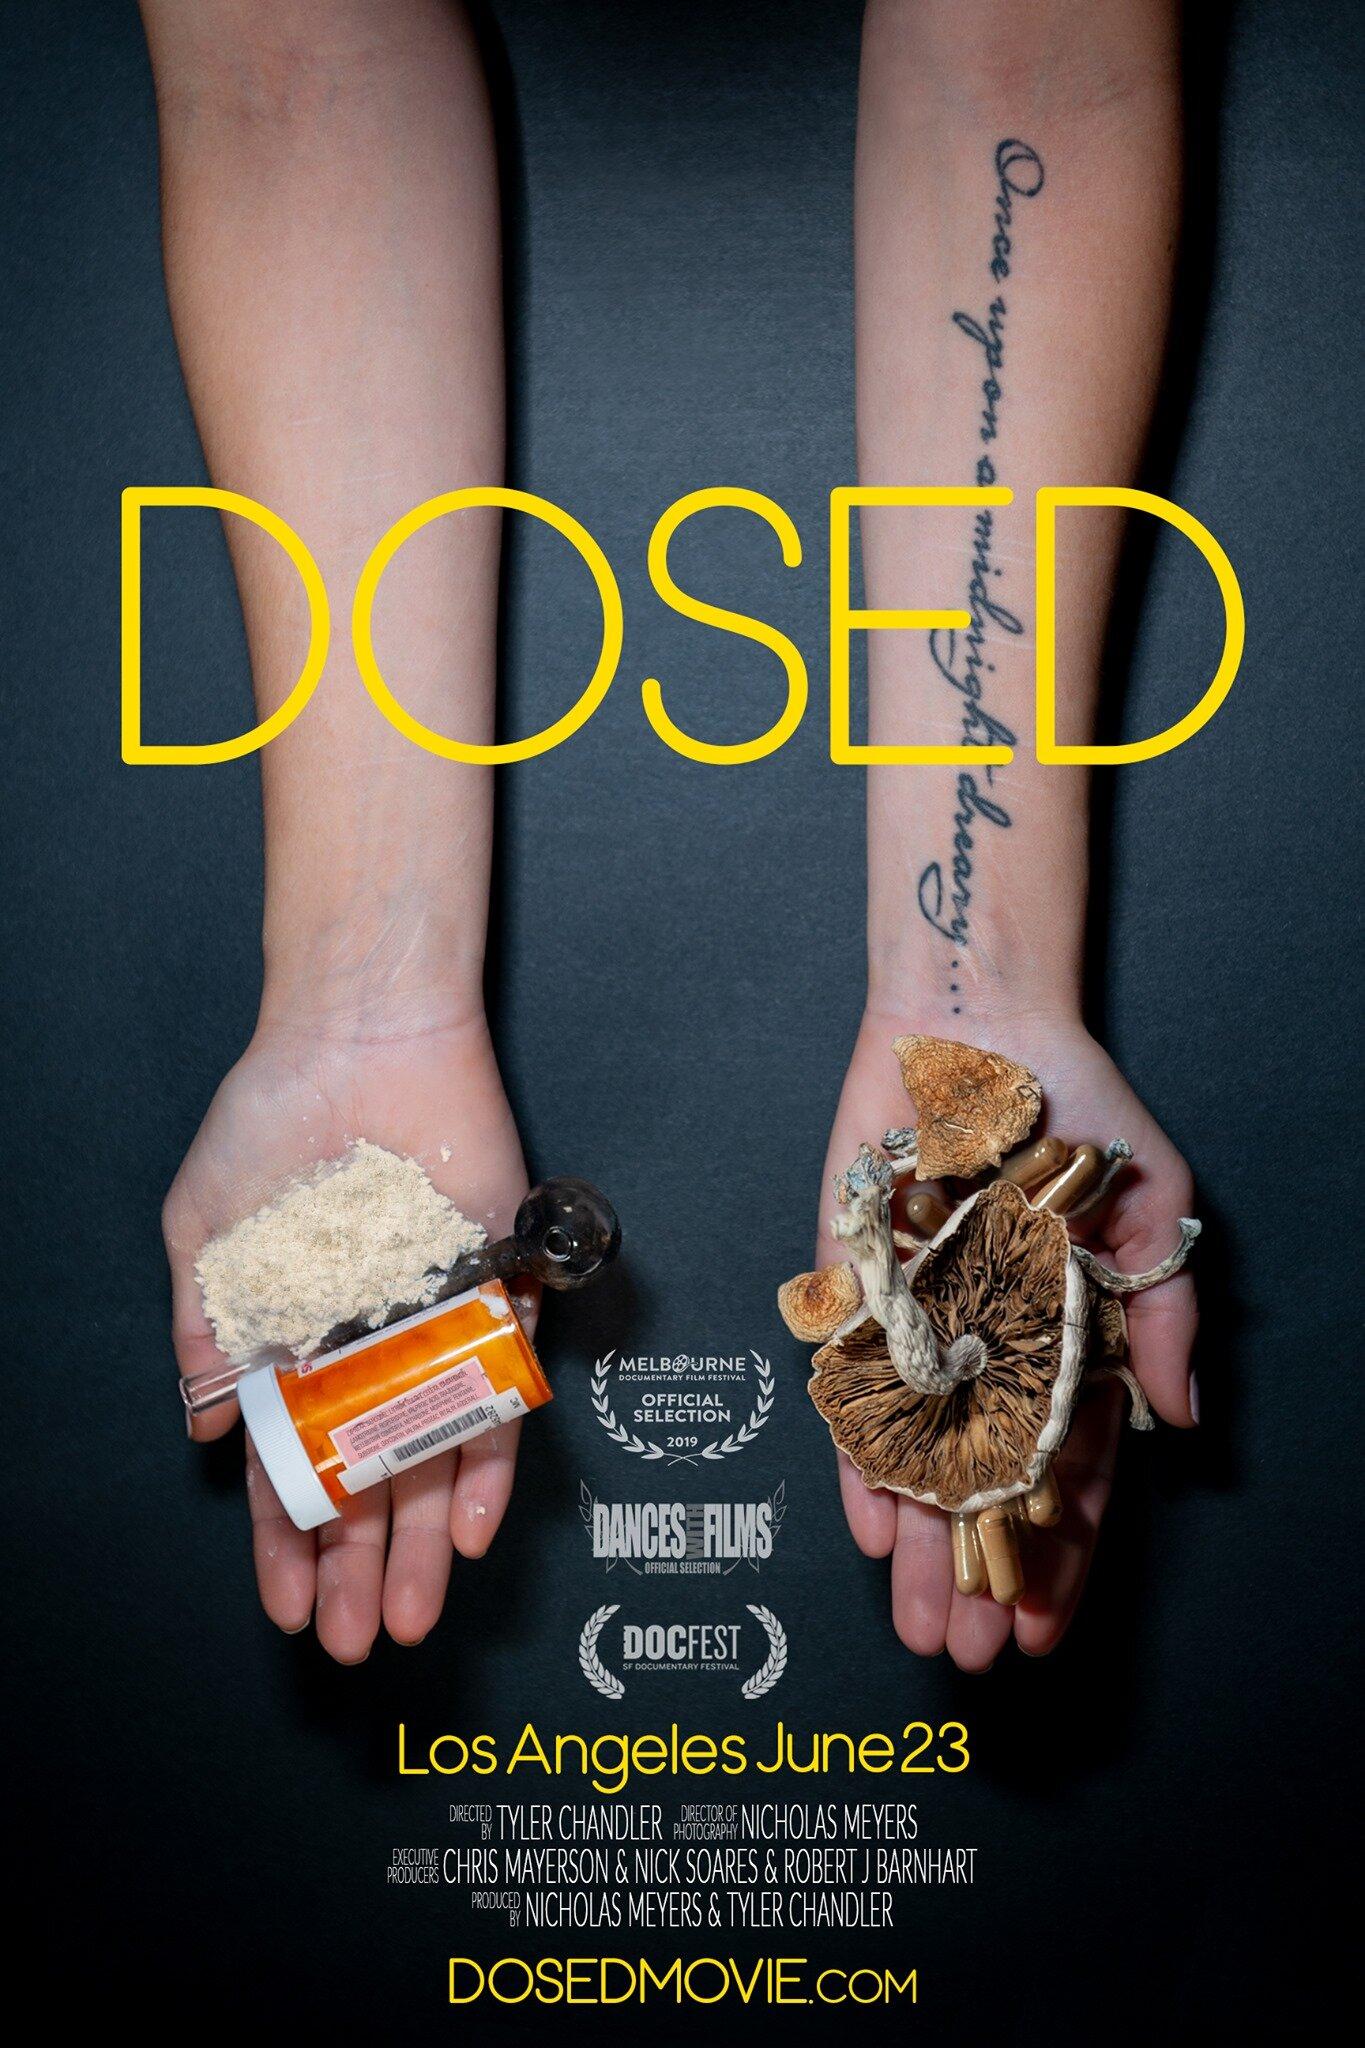 DOSED - Feedback Screening